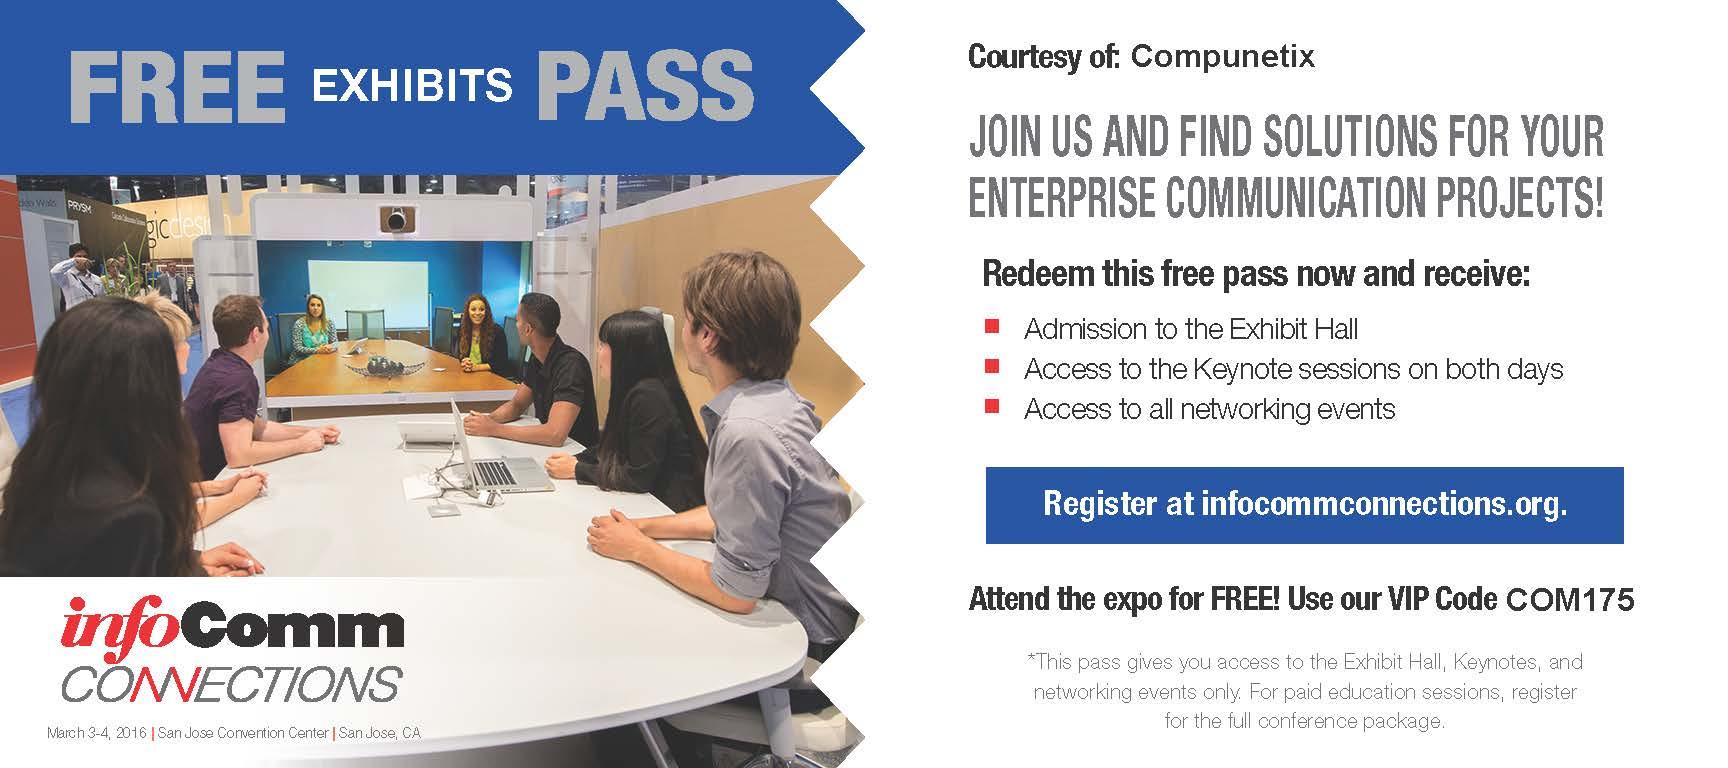 InfoComm Connections_San Jose_VIP PASS_COMPUNETIX2